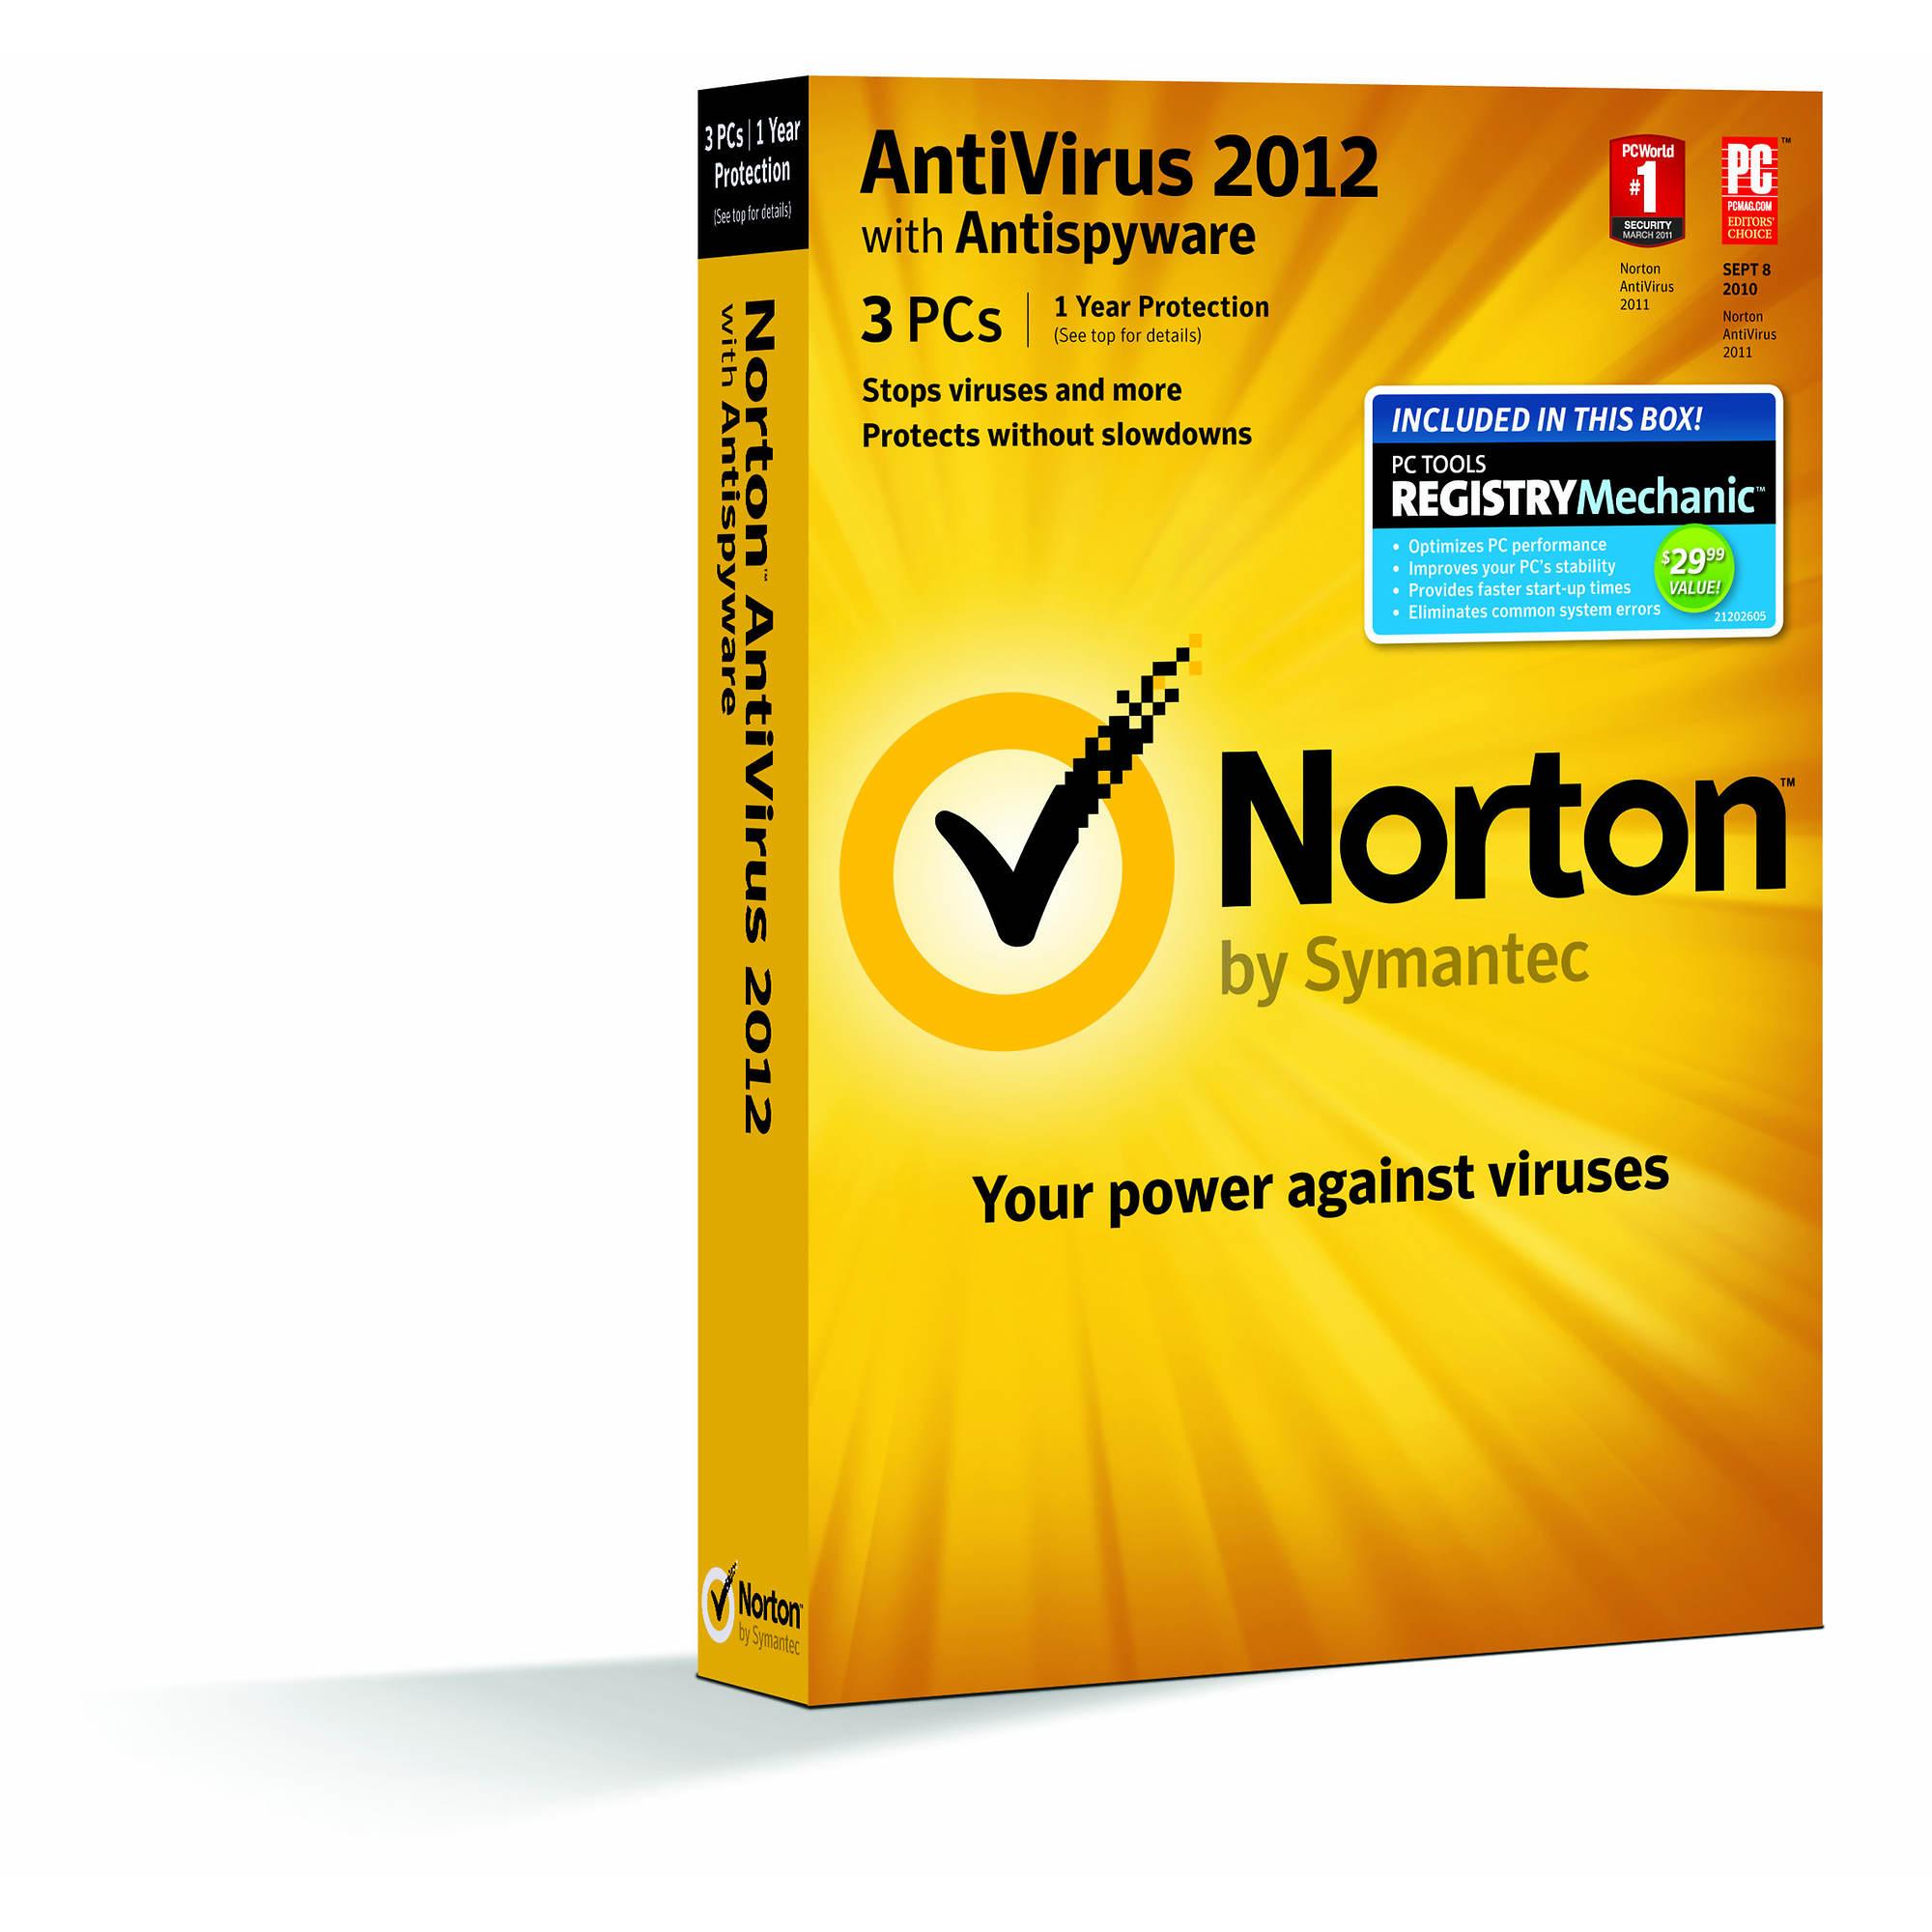 Antivirus for PC Mac Android & iOS